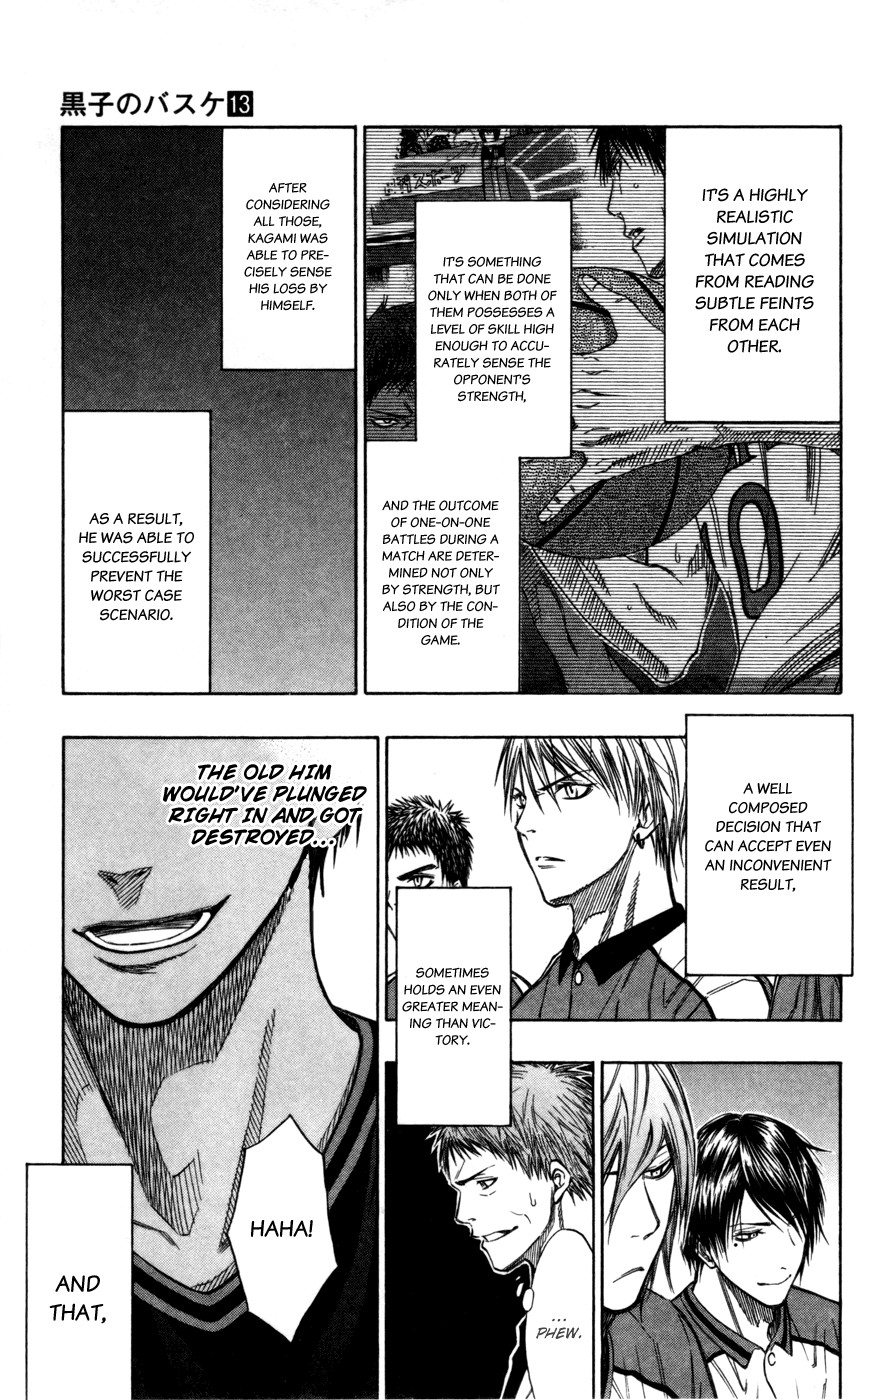 Kuroko no Basket Manga Chapter 117 - Image 3_179